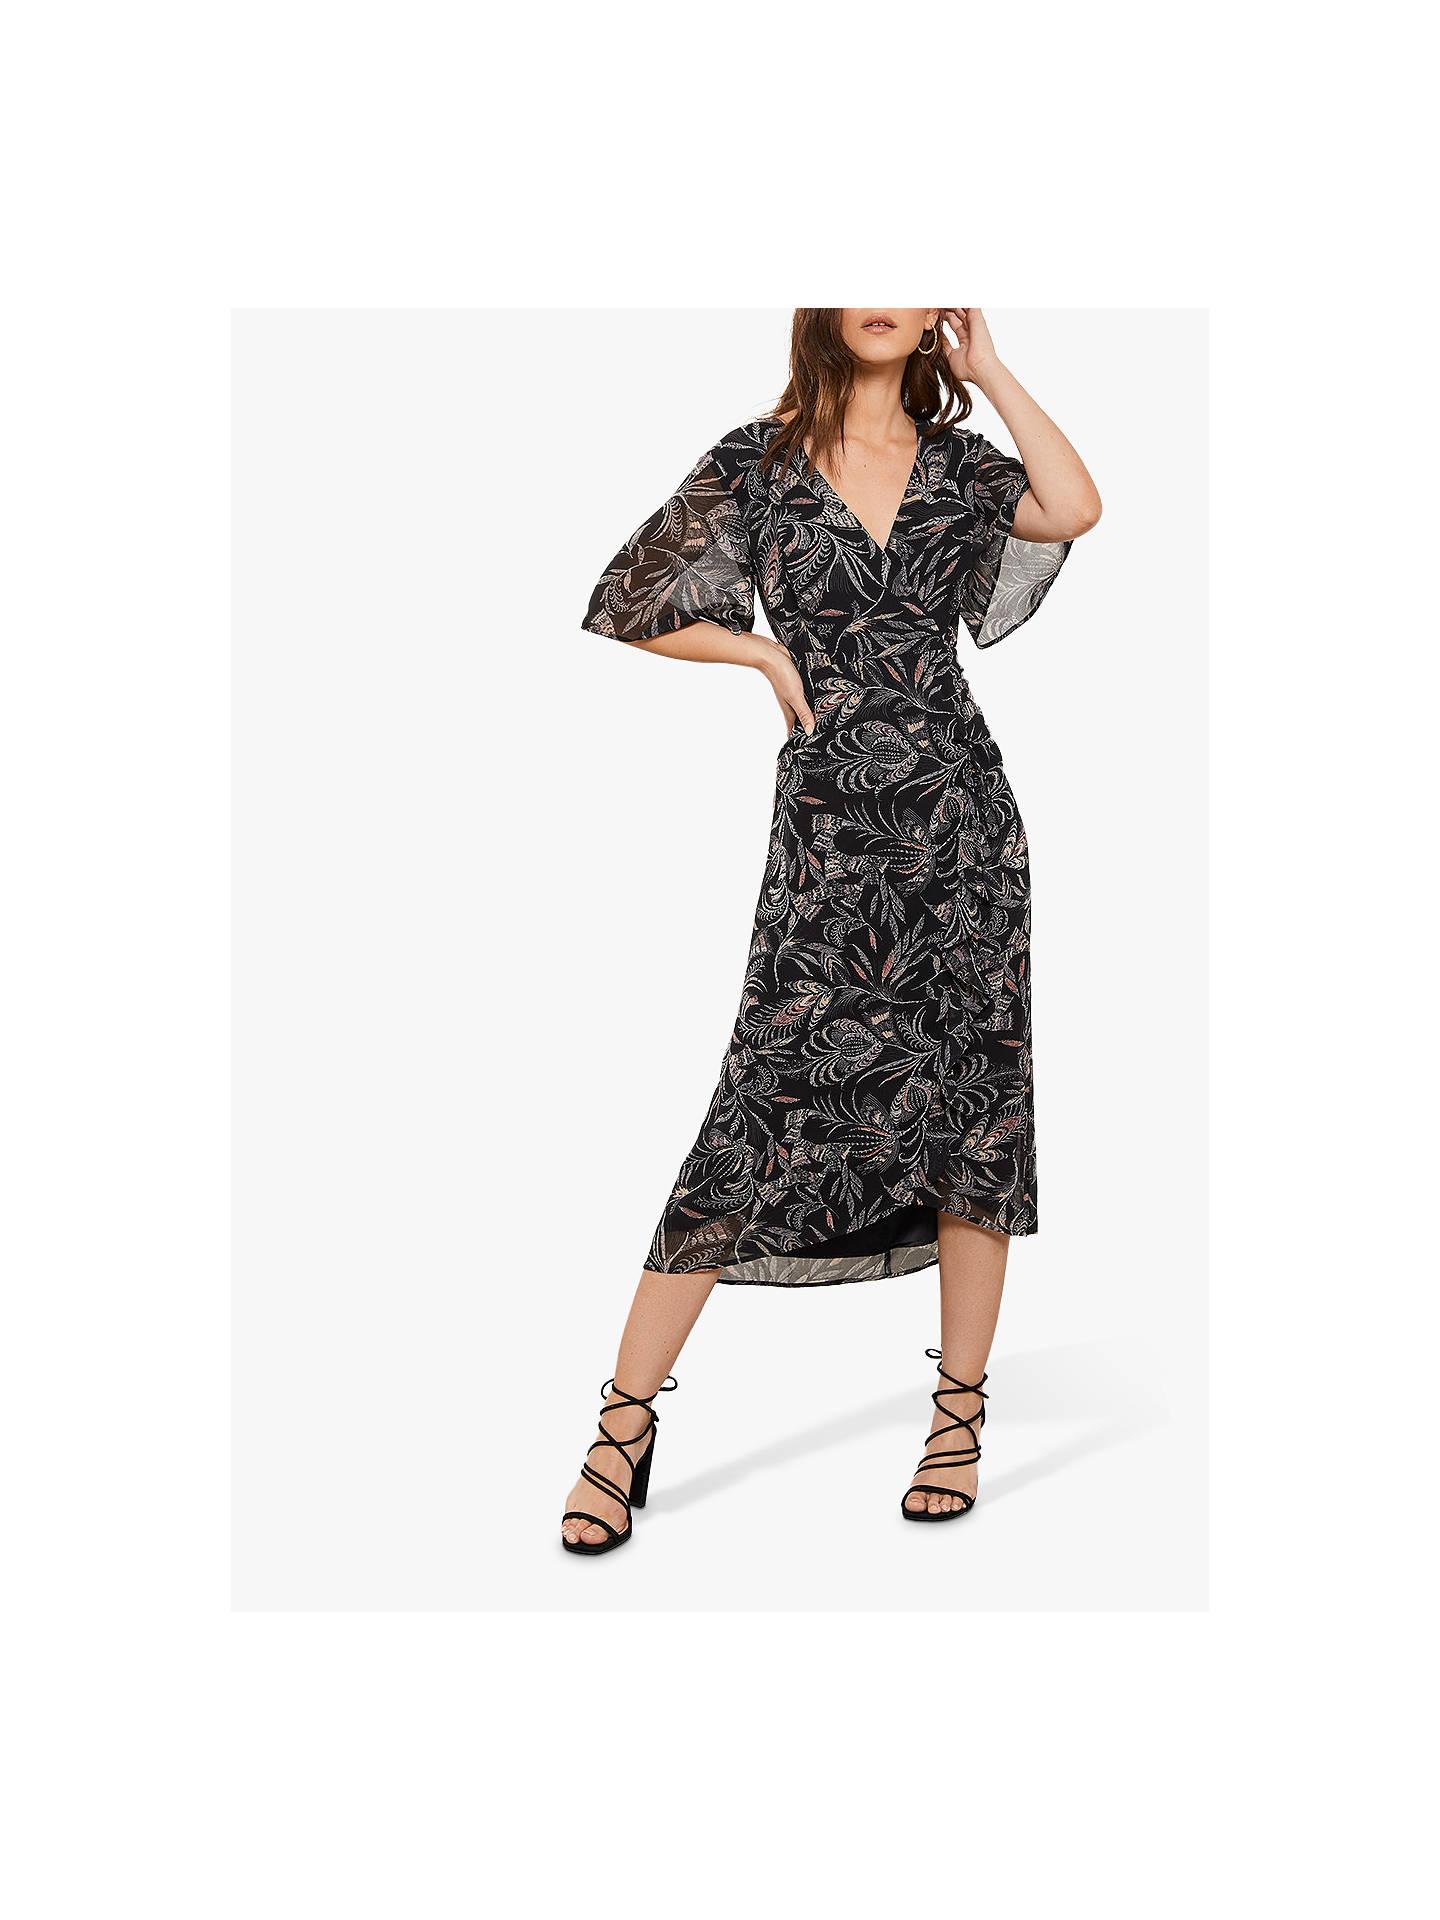 40340c060988 Buy Mint Velvet Bella Print Ruched Dress, Multi, 6 Online at johnlewis.com  ...